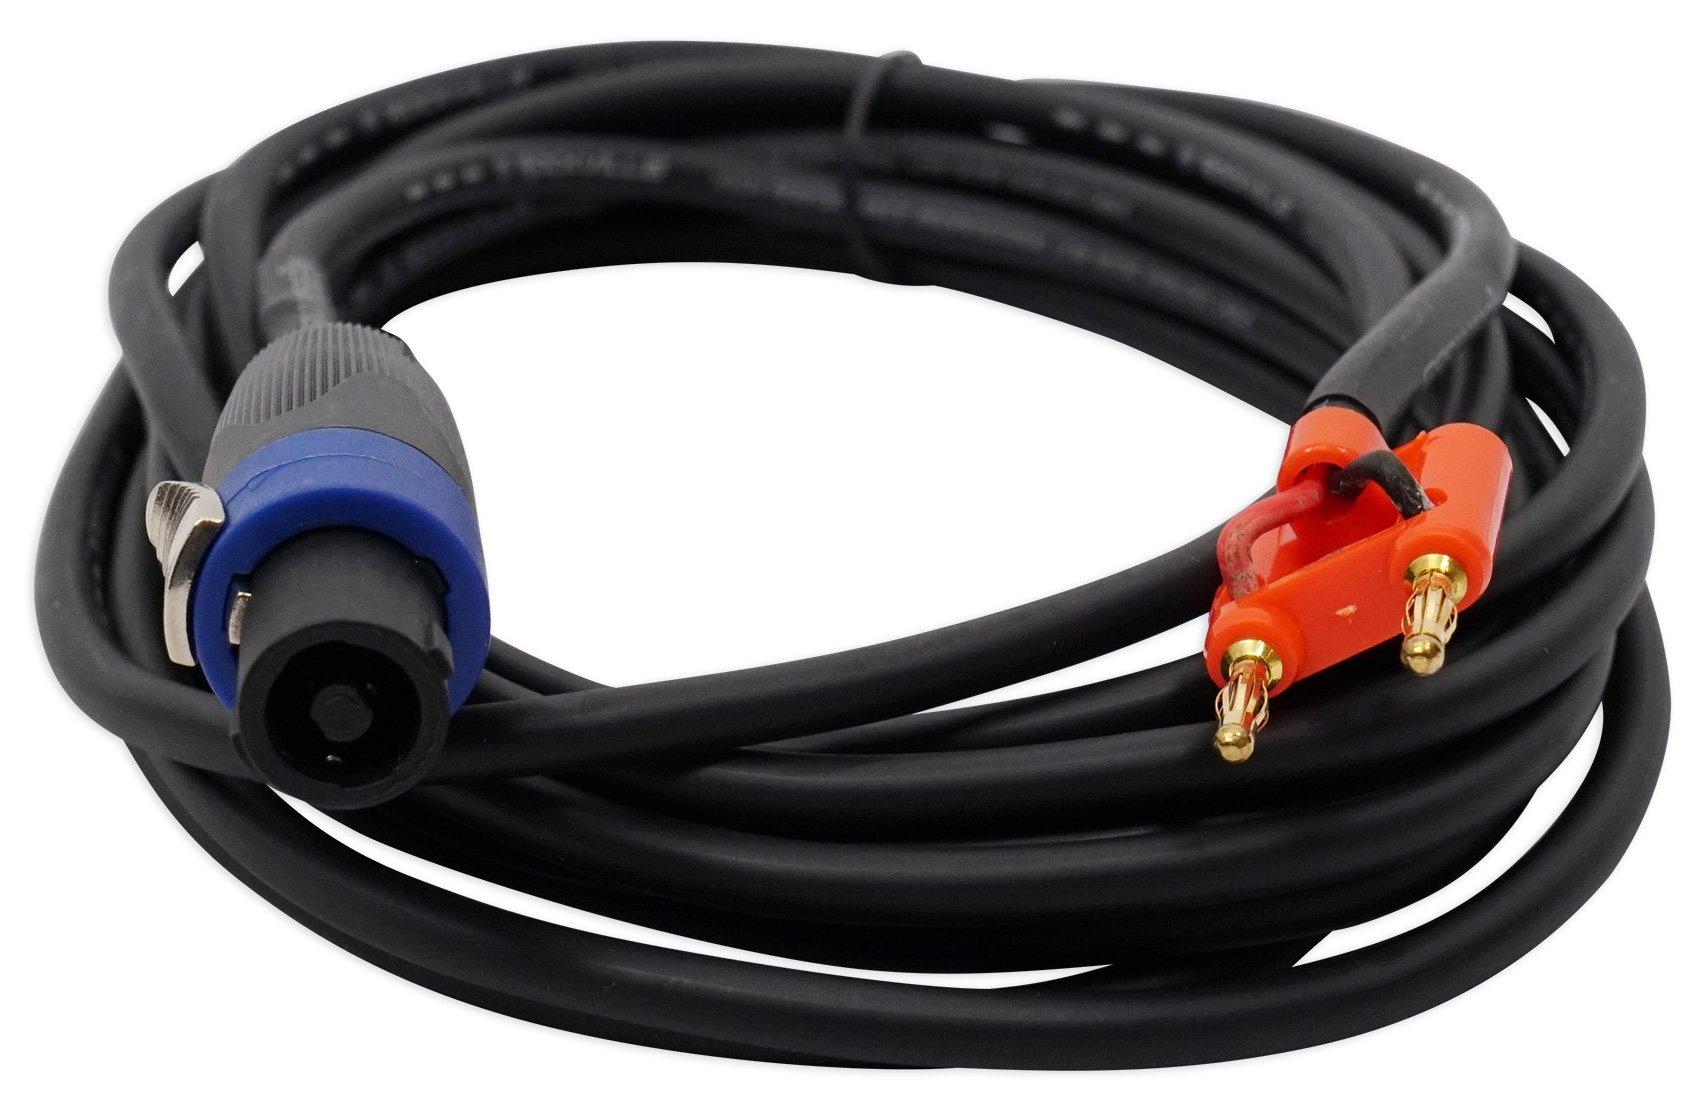 Rockville 20 Foot Speakon to Banana Speaker Cable, 16 Gauge, 100% Copper! (RSB16)